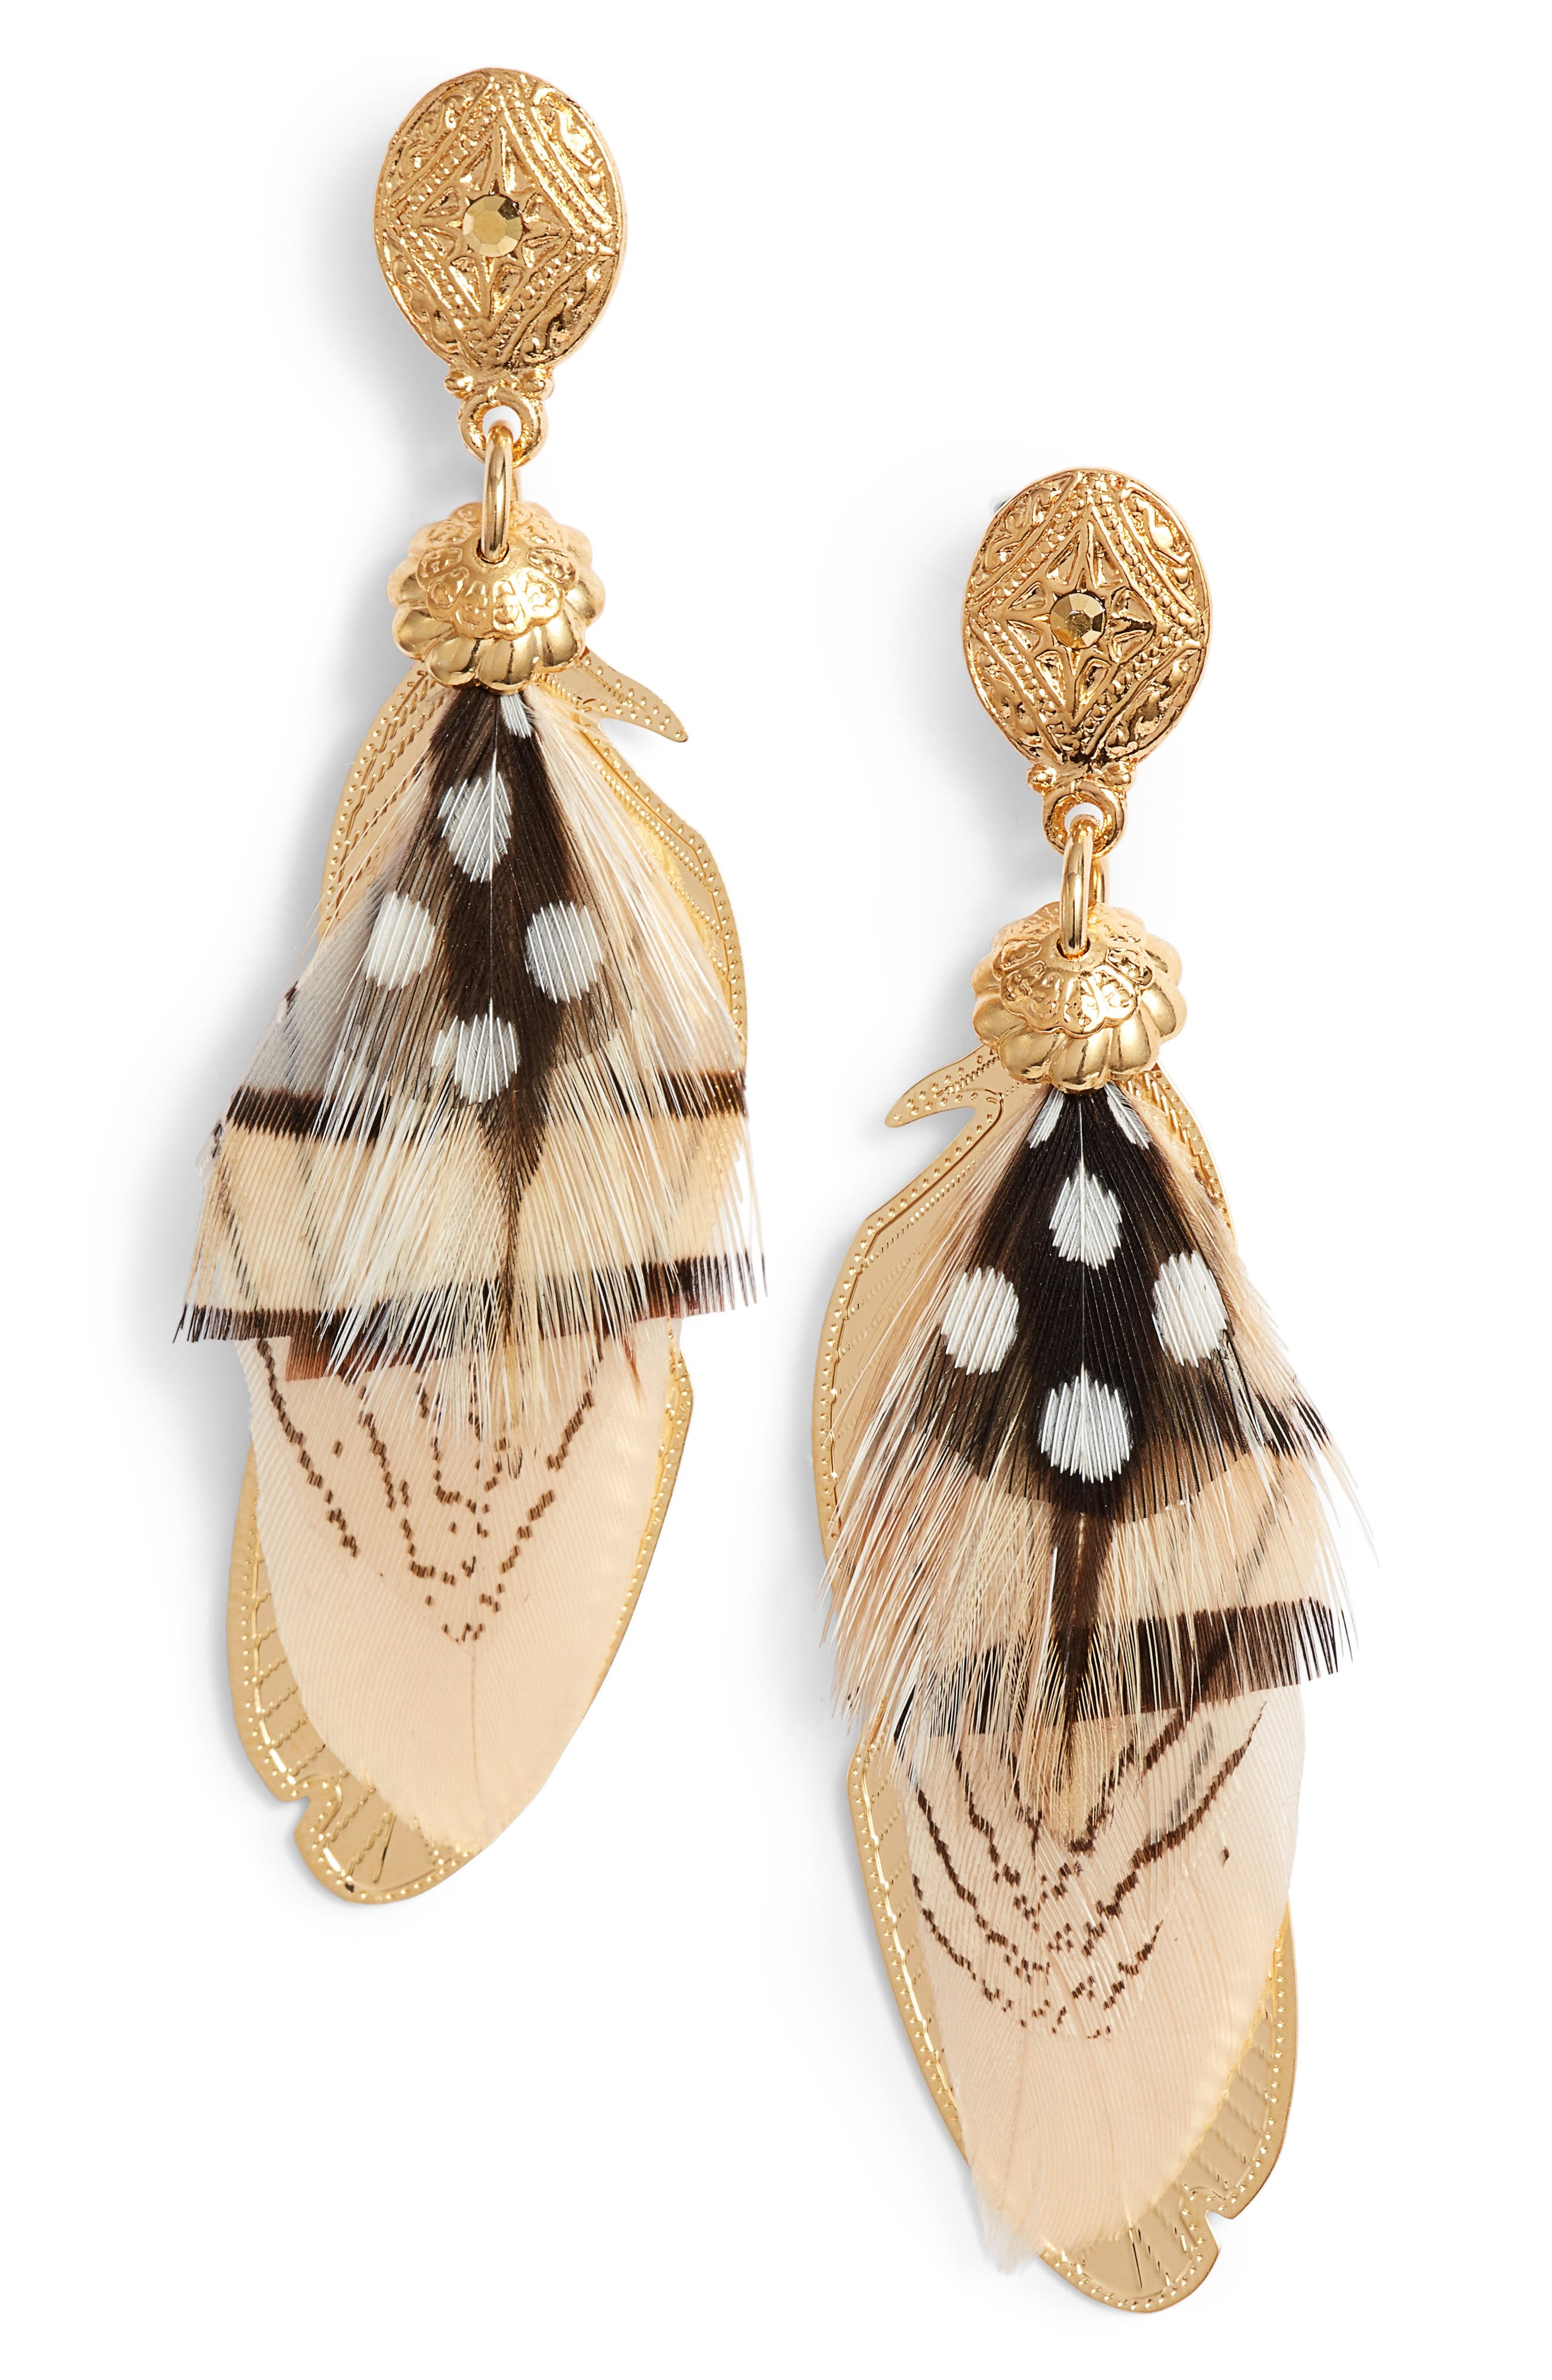 Small Sao Feather Earrings,                             Main thumbnail 1, color,                             WHITE